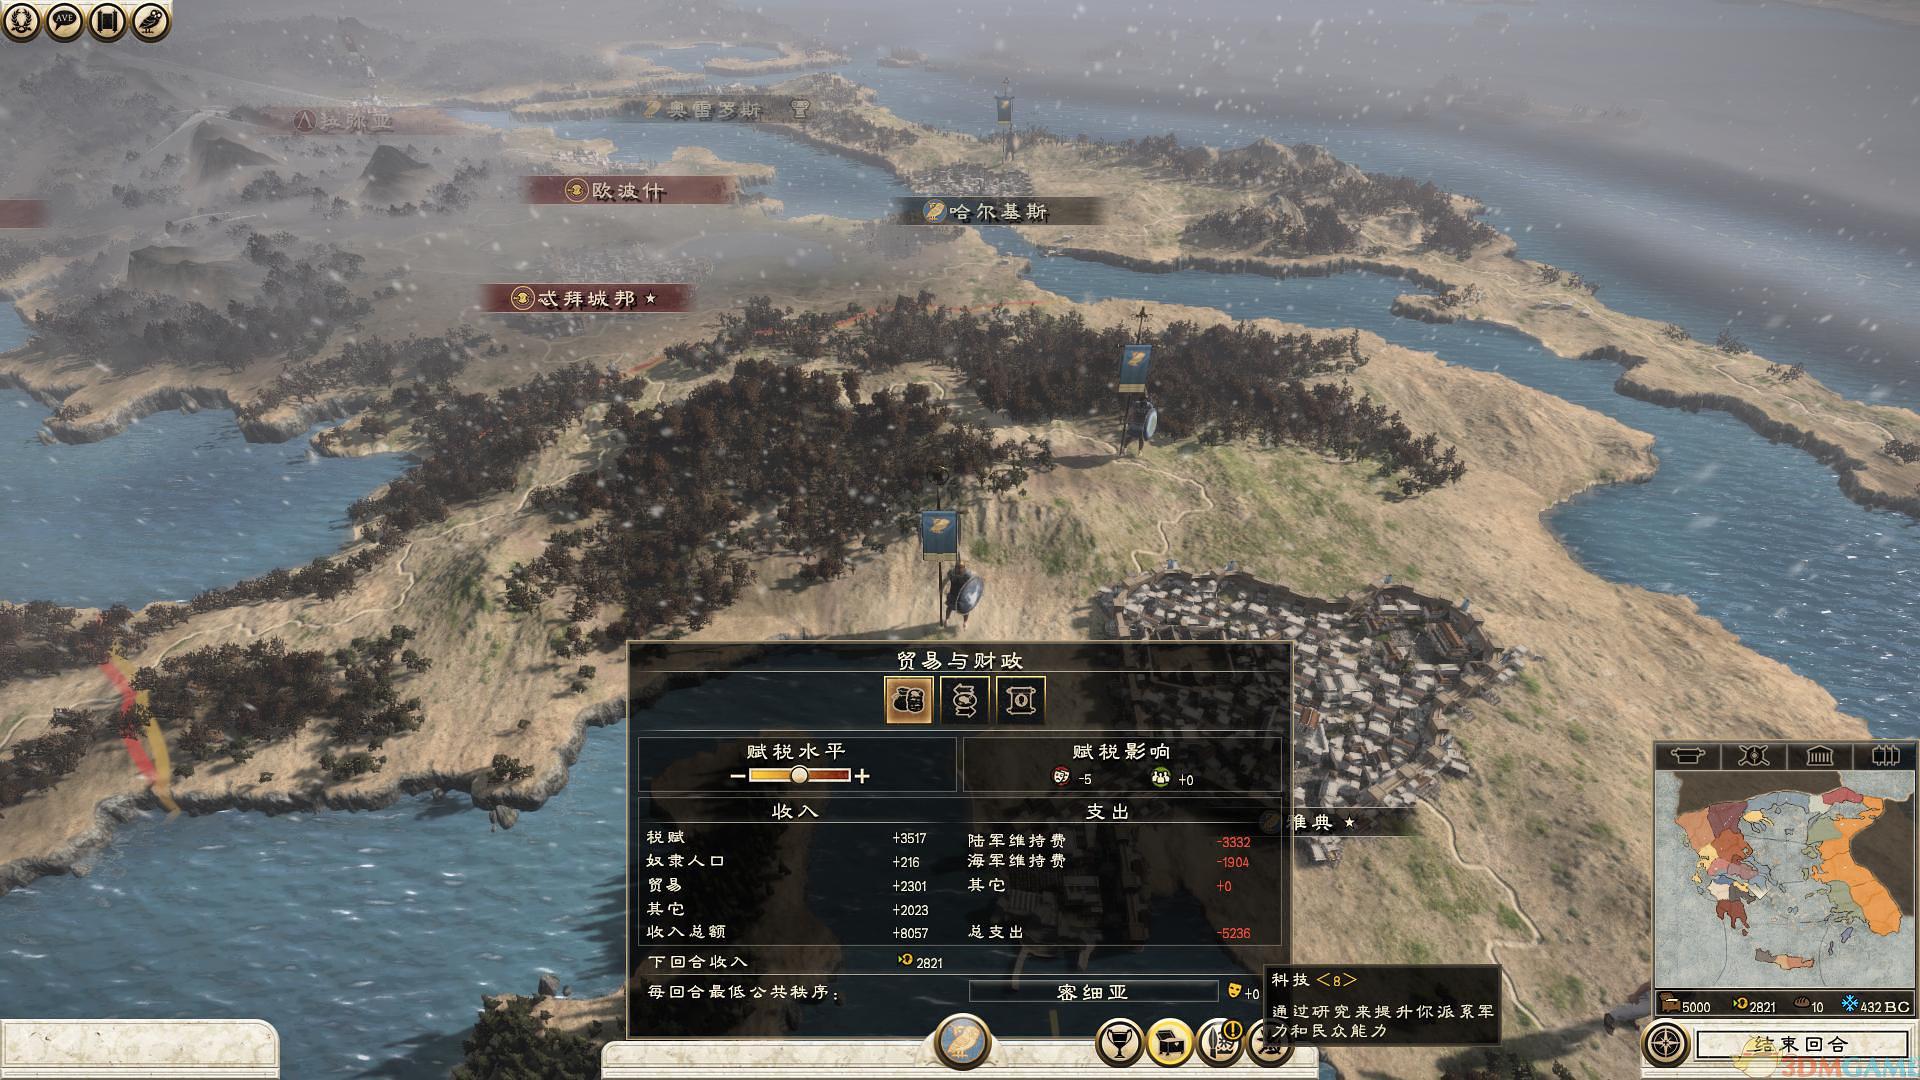 罗马2:全面战争 9号升级+DLC+破解补丁[RELOADED]